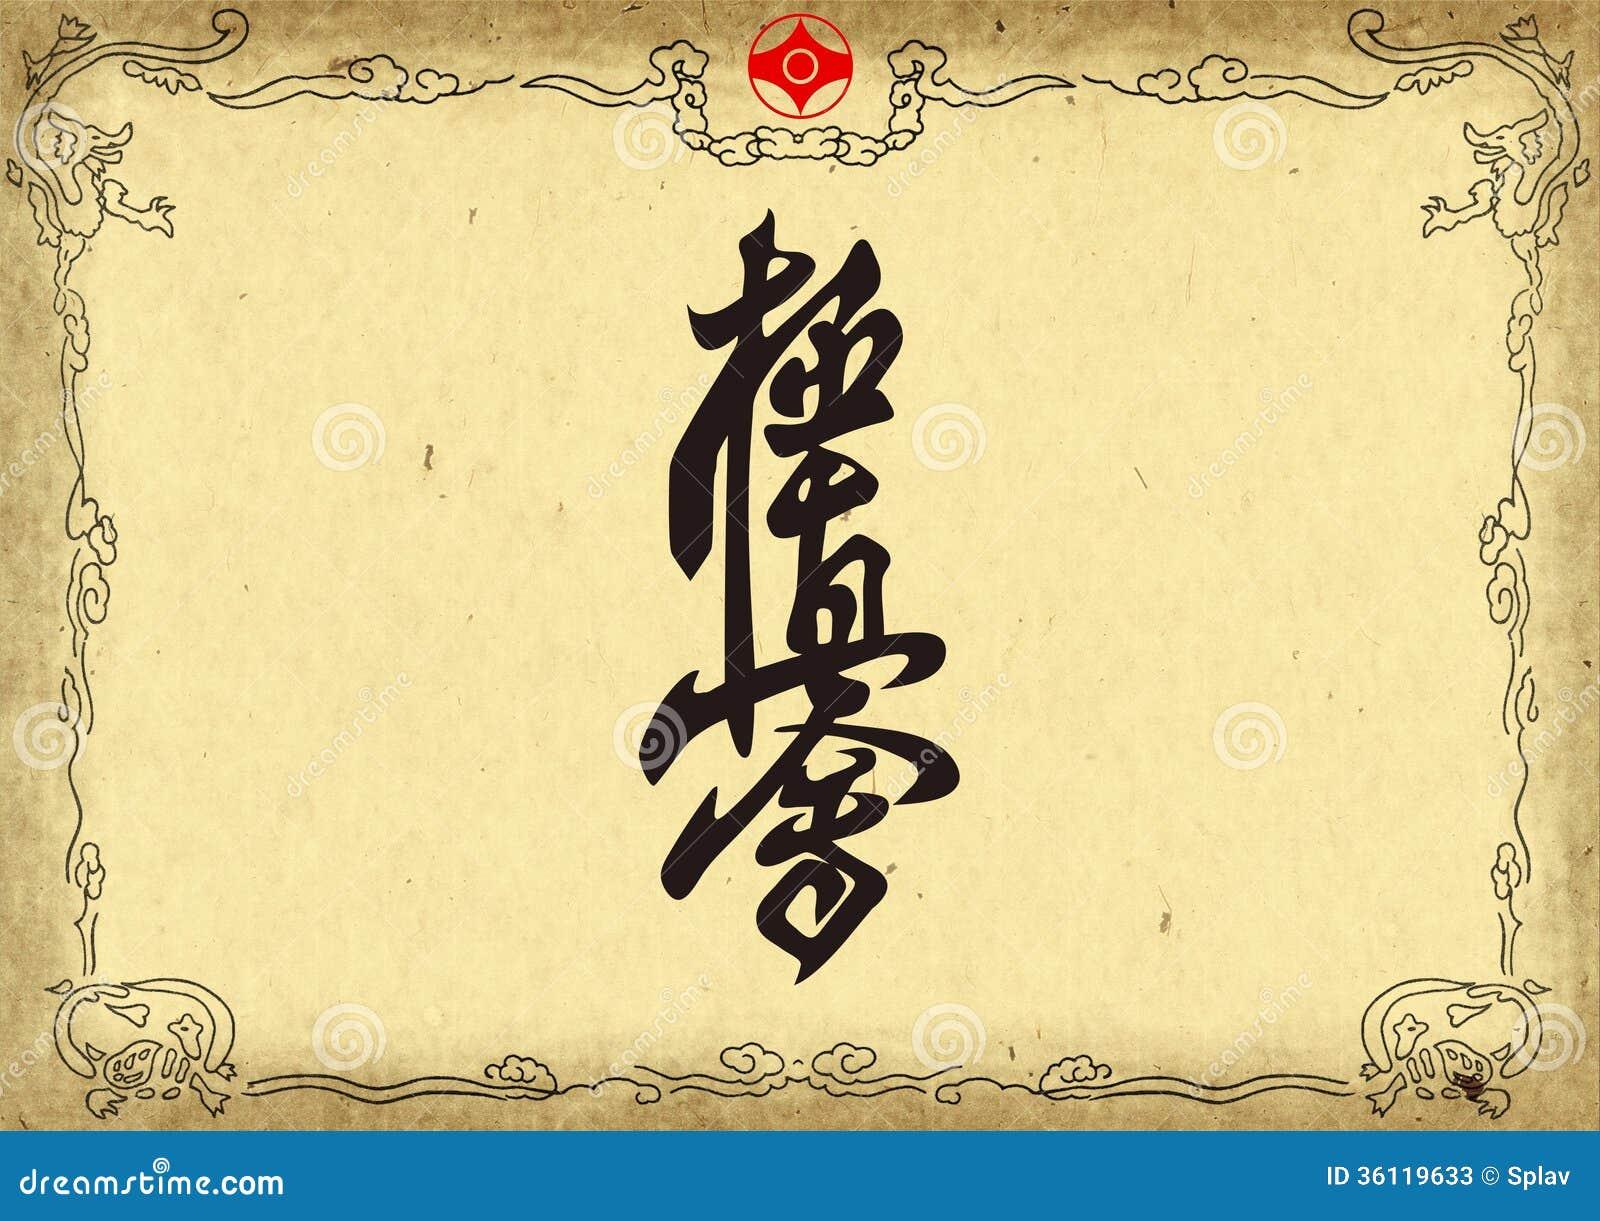 Certificate,diplom Karate Stock Photos - Image: 36119633